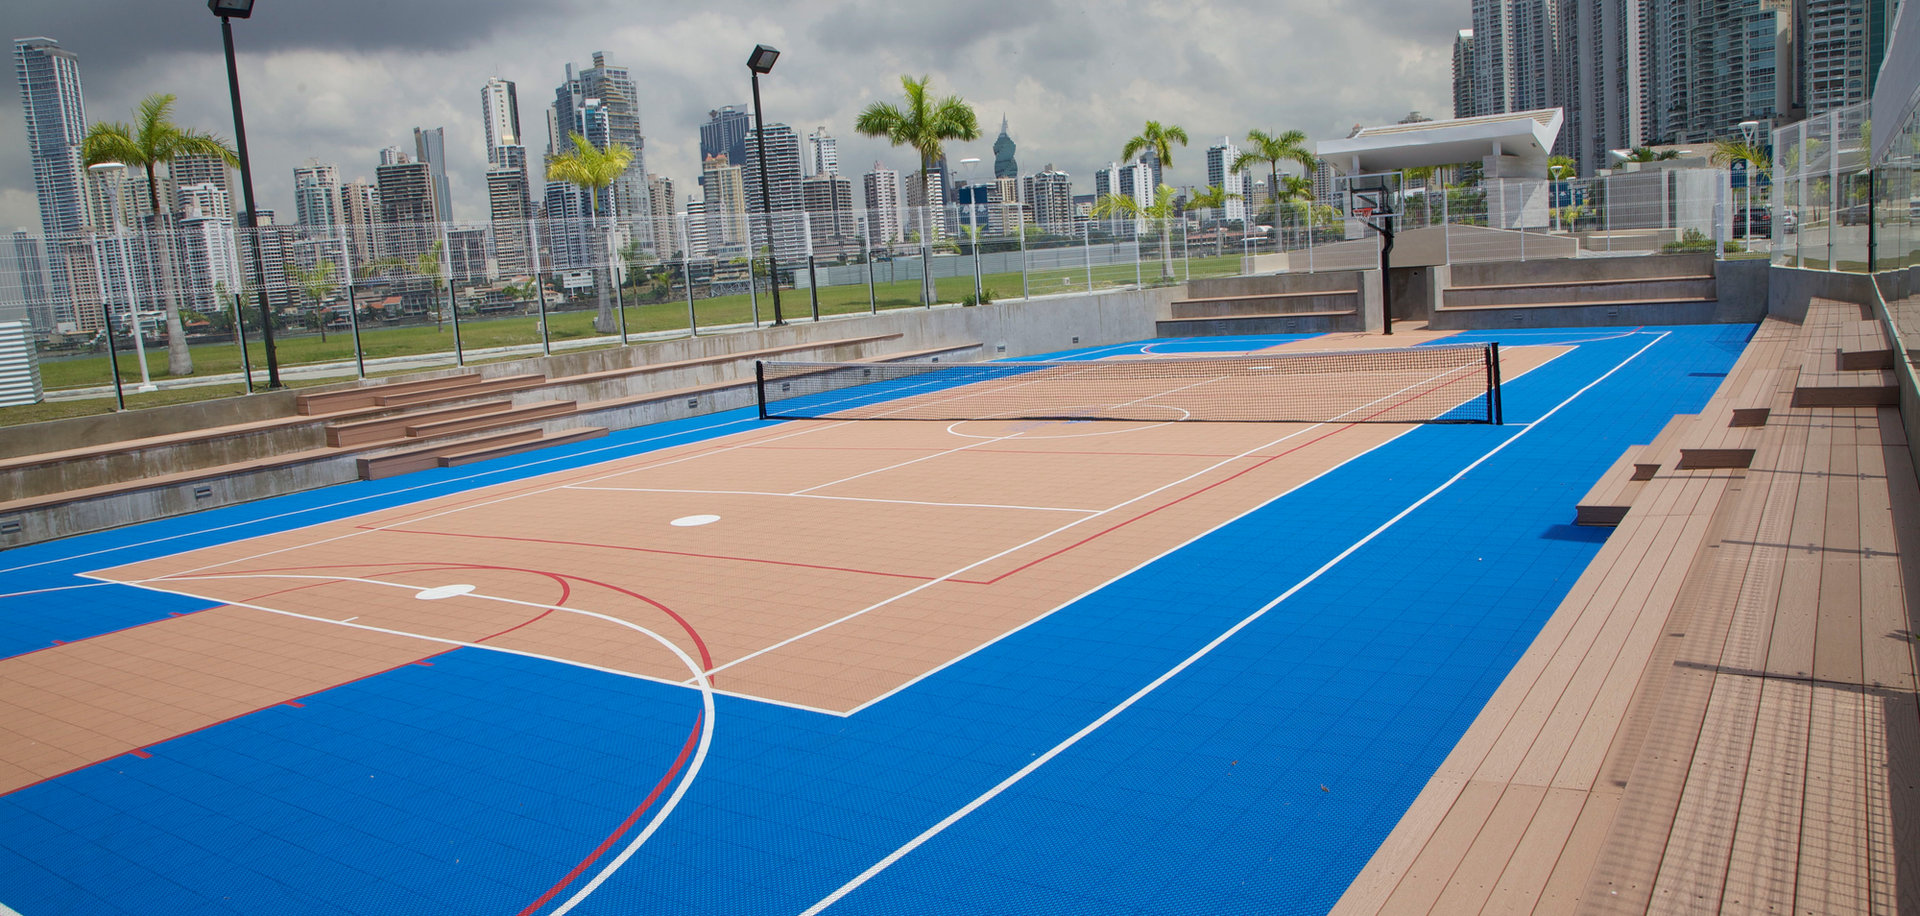 Residencias con canchas de tenis en Panamá